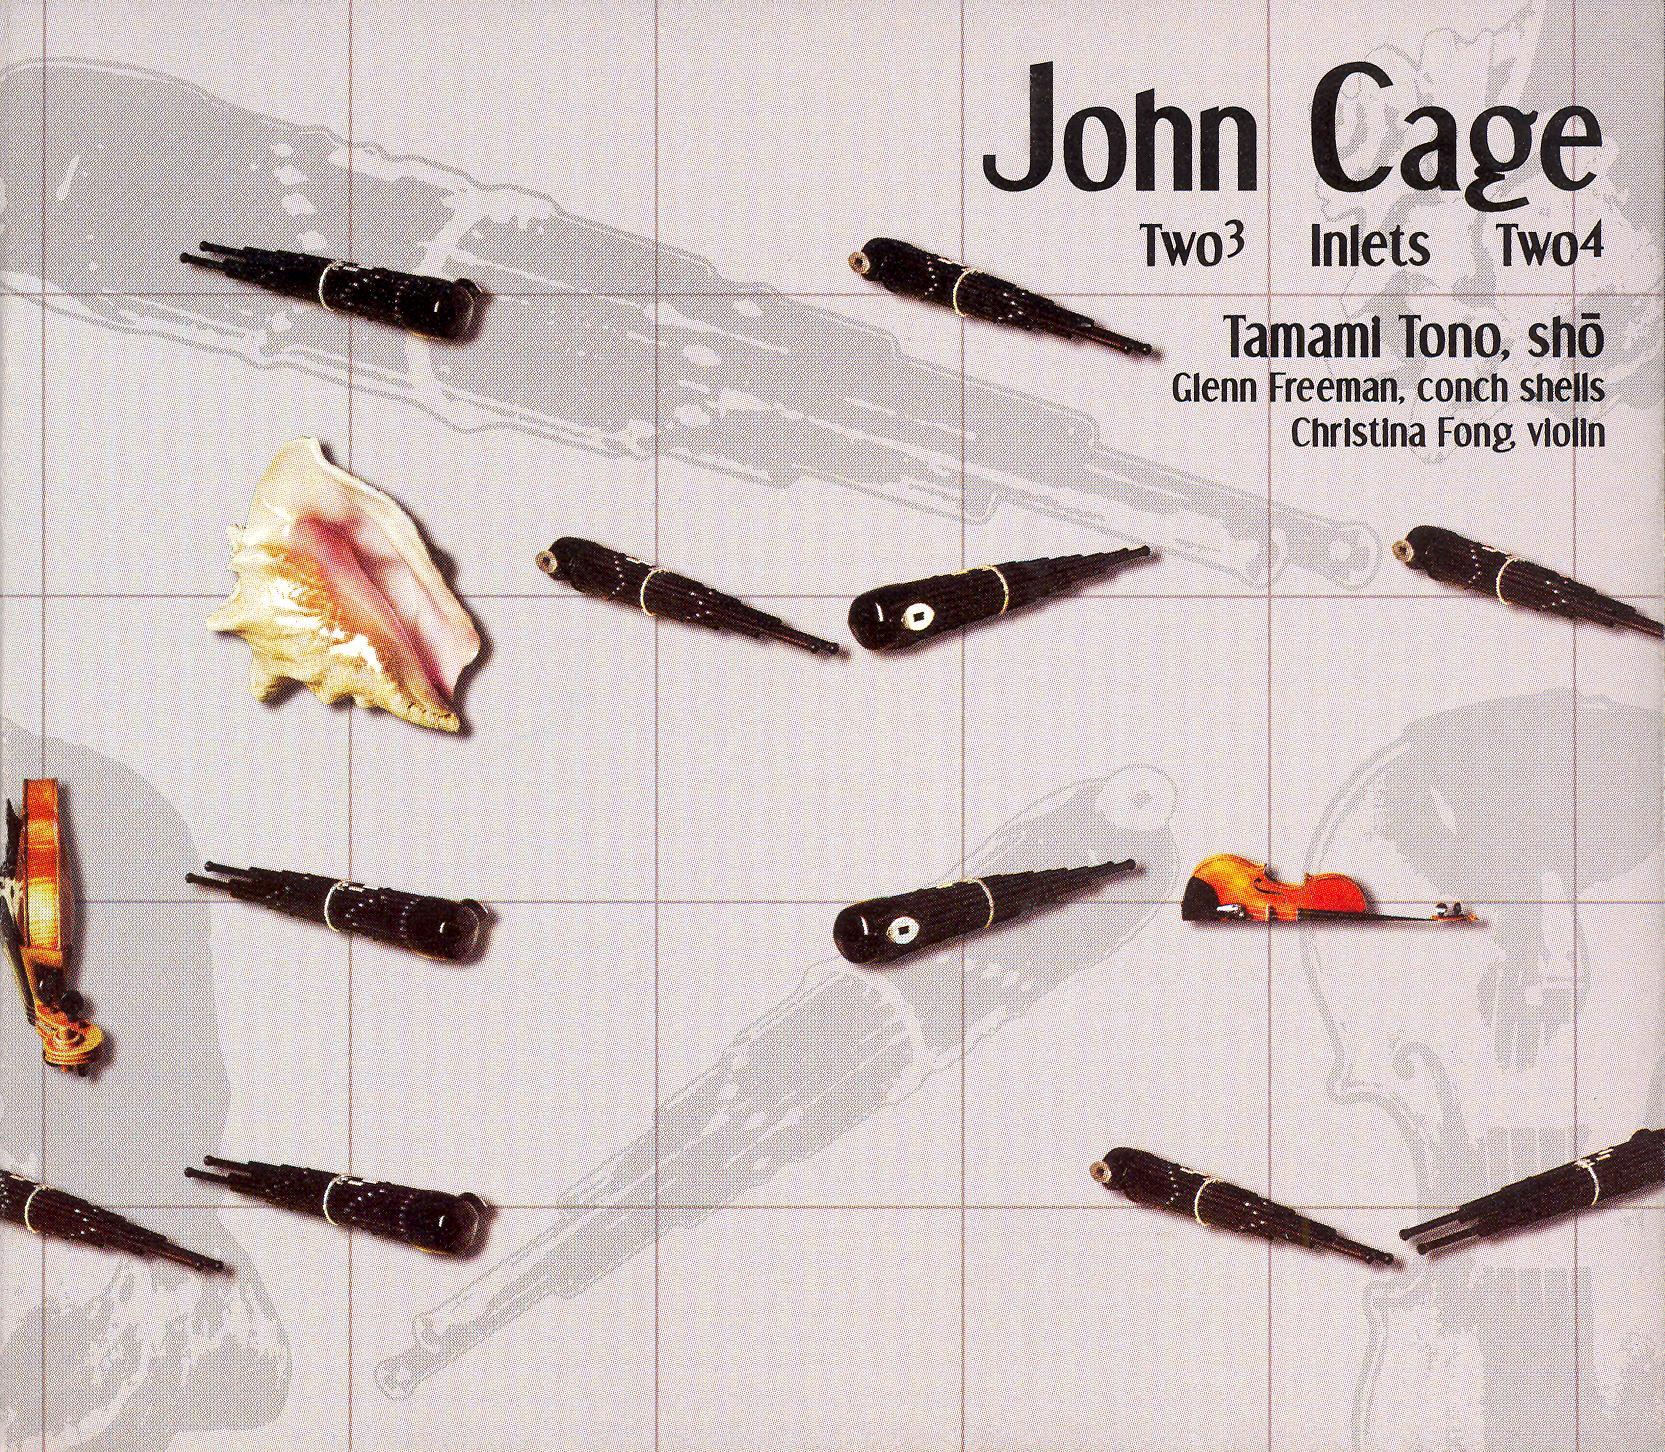 Tamami Tono: John Cage - Two³, Inlets, Two4